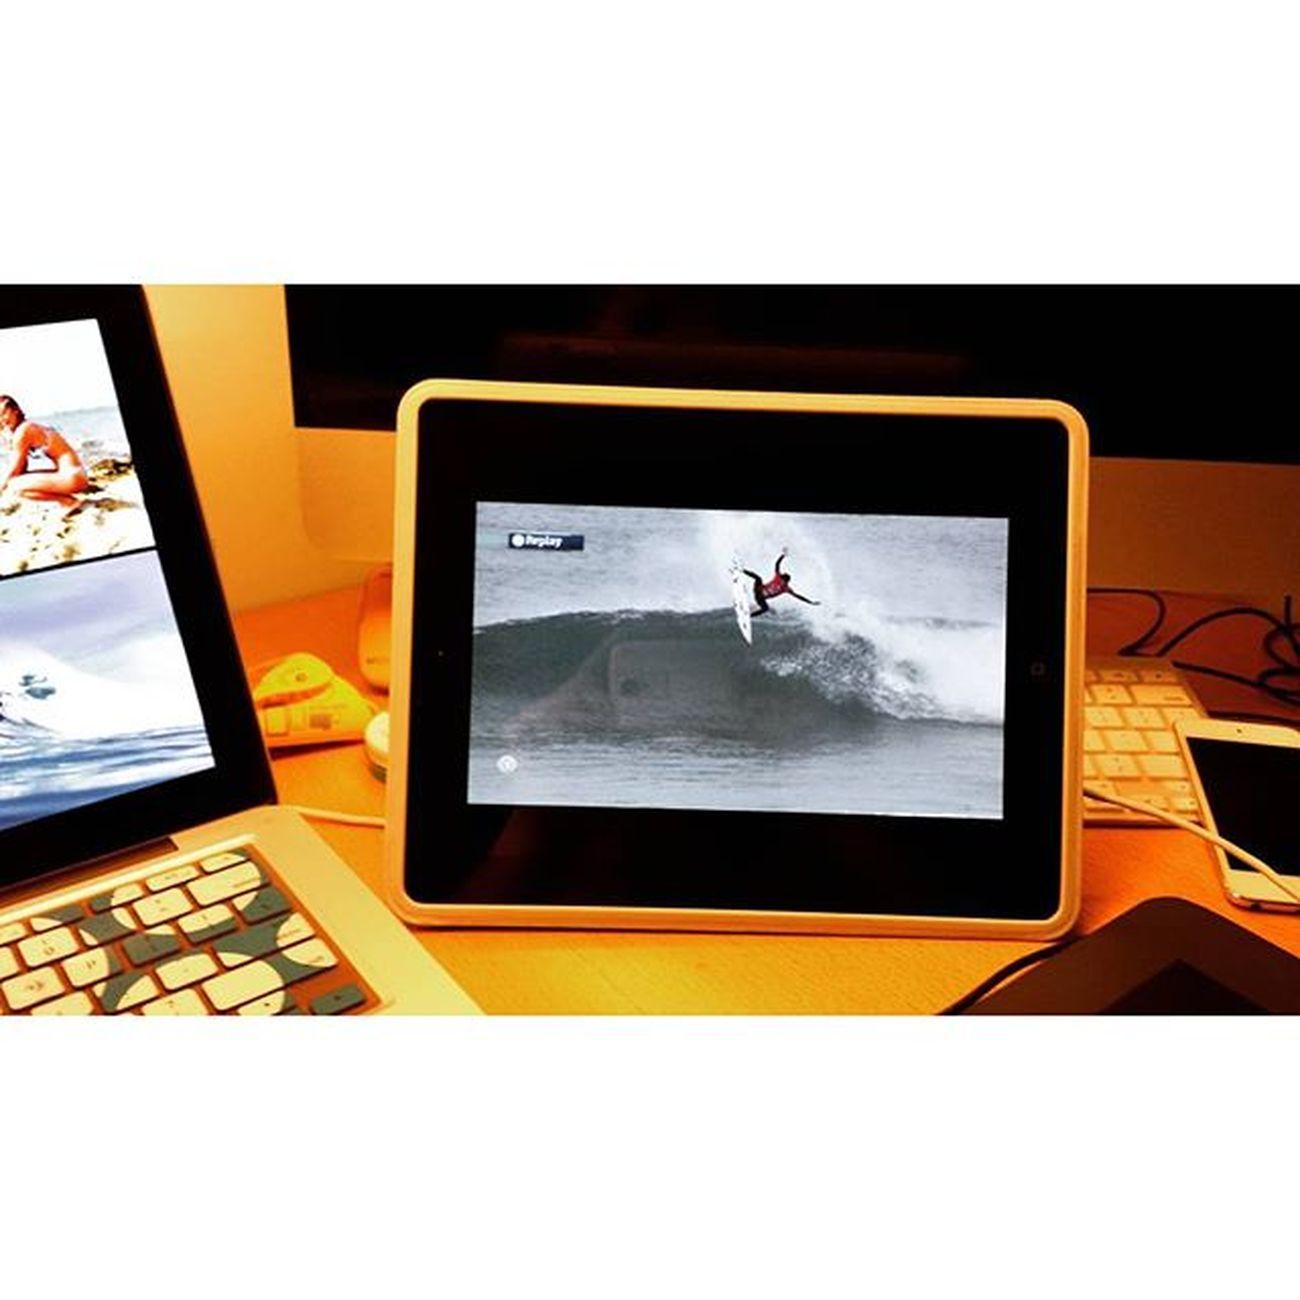 Must see heat from round 3 Worldsurfleague Mocheripcurlpro Filipetoledo Masonho Round3heat1 surfing live iPad mac iPod galaxys4photo Wacom contest resting fun busyhomework matthewhauadventure